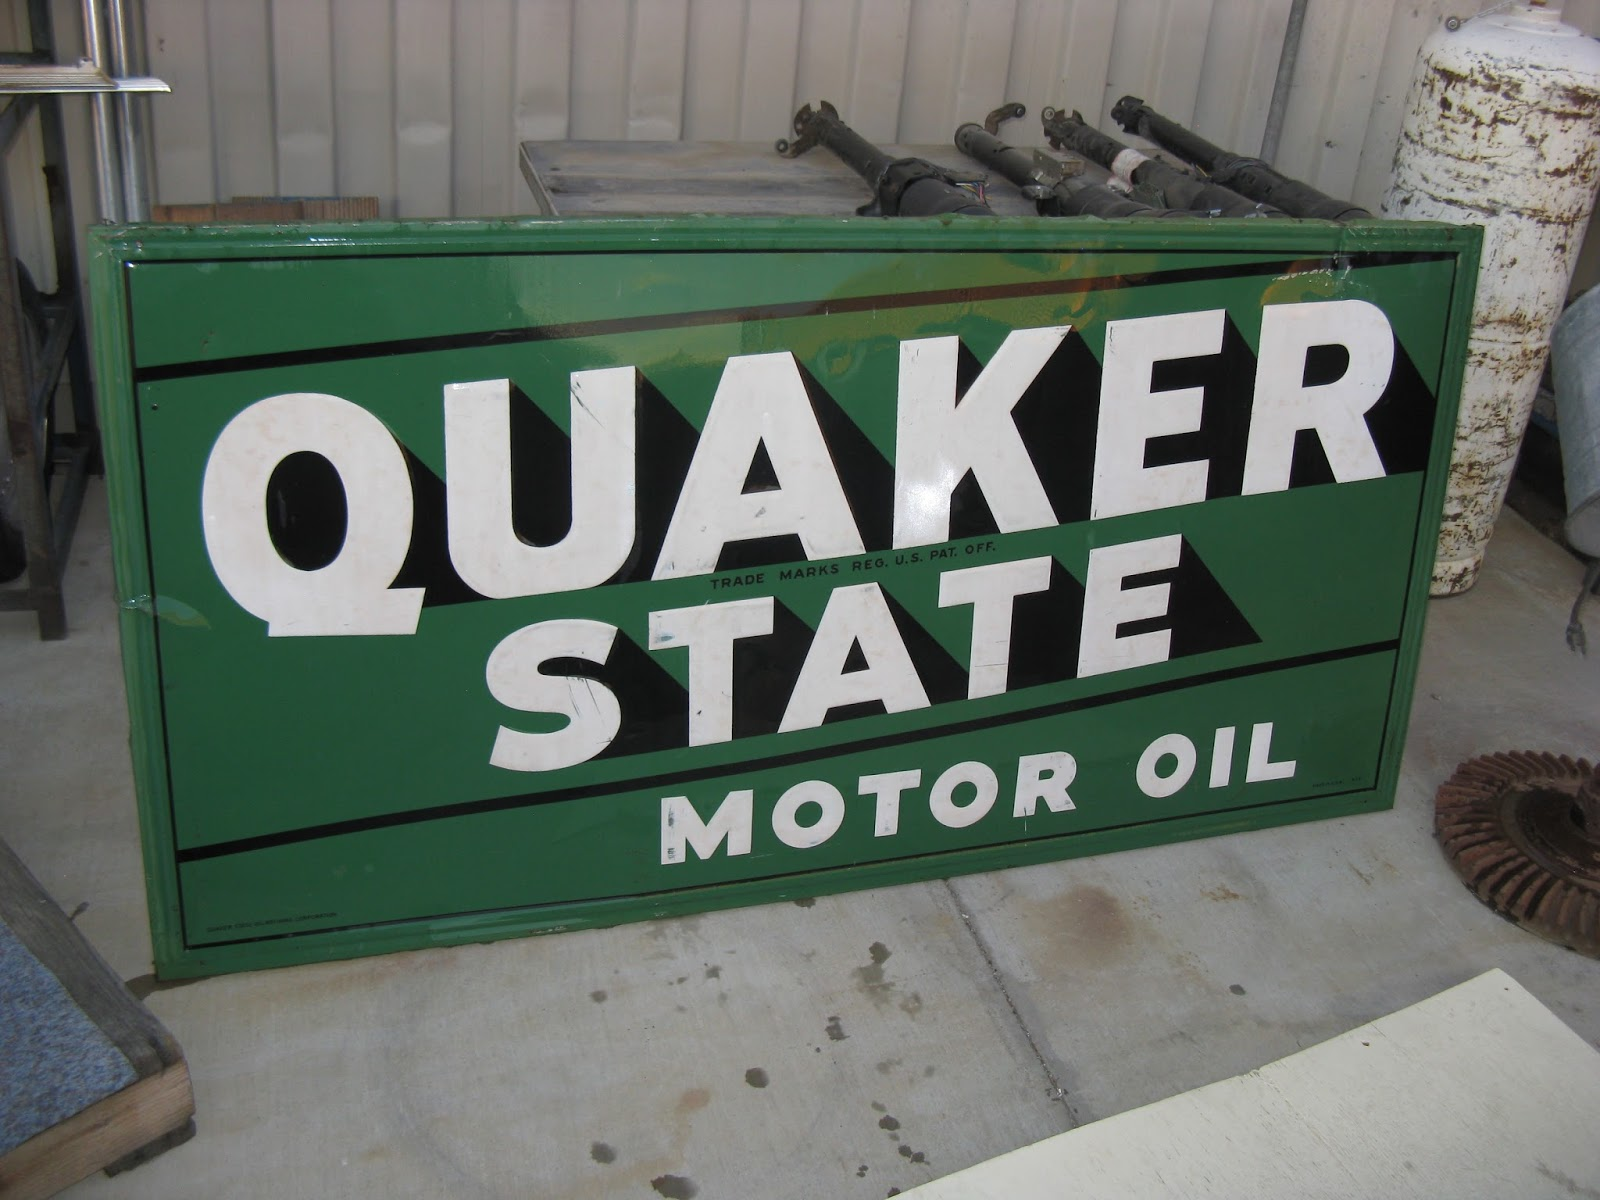 Two Quaker State Motor Oil Porcelain Signs A Unique